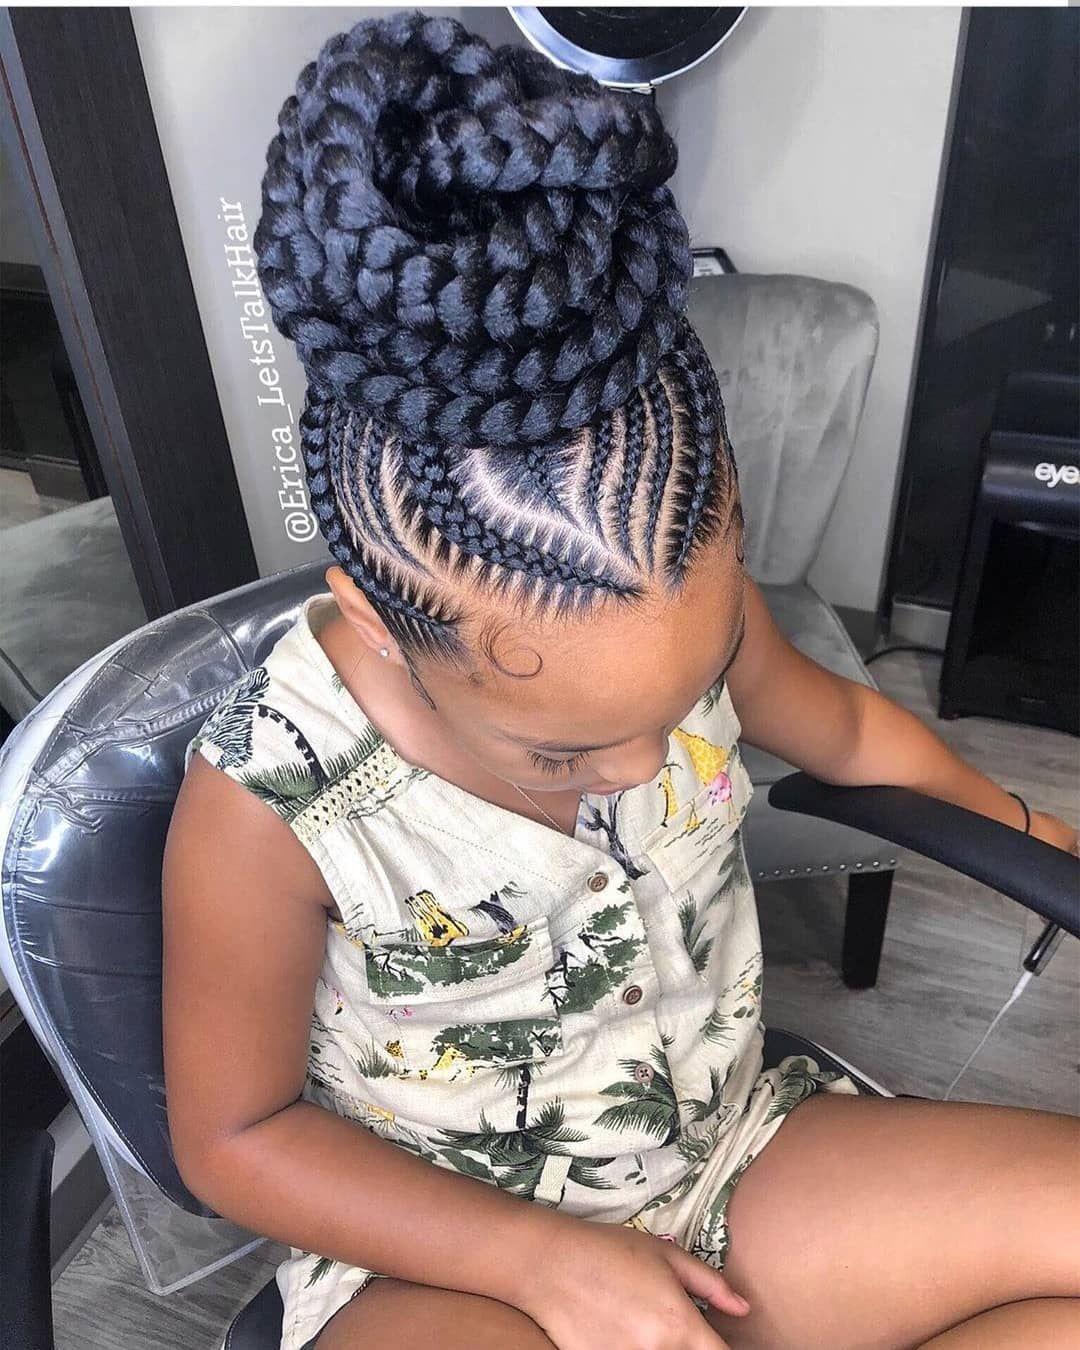 2021 Black Braided Hairstyles for Ladies: 45 Most Trendy ...